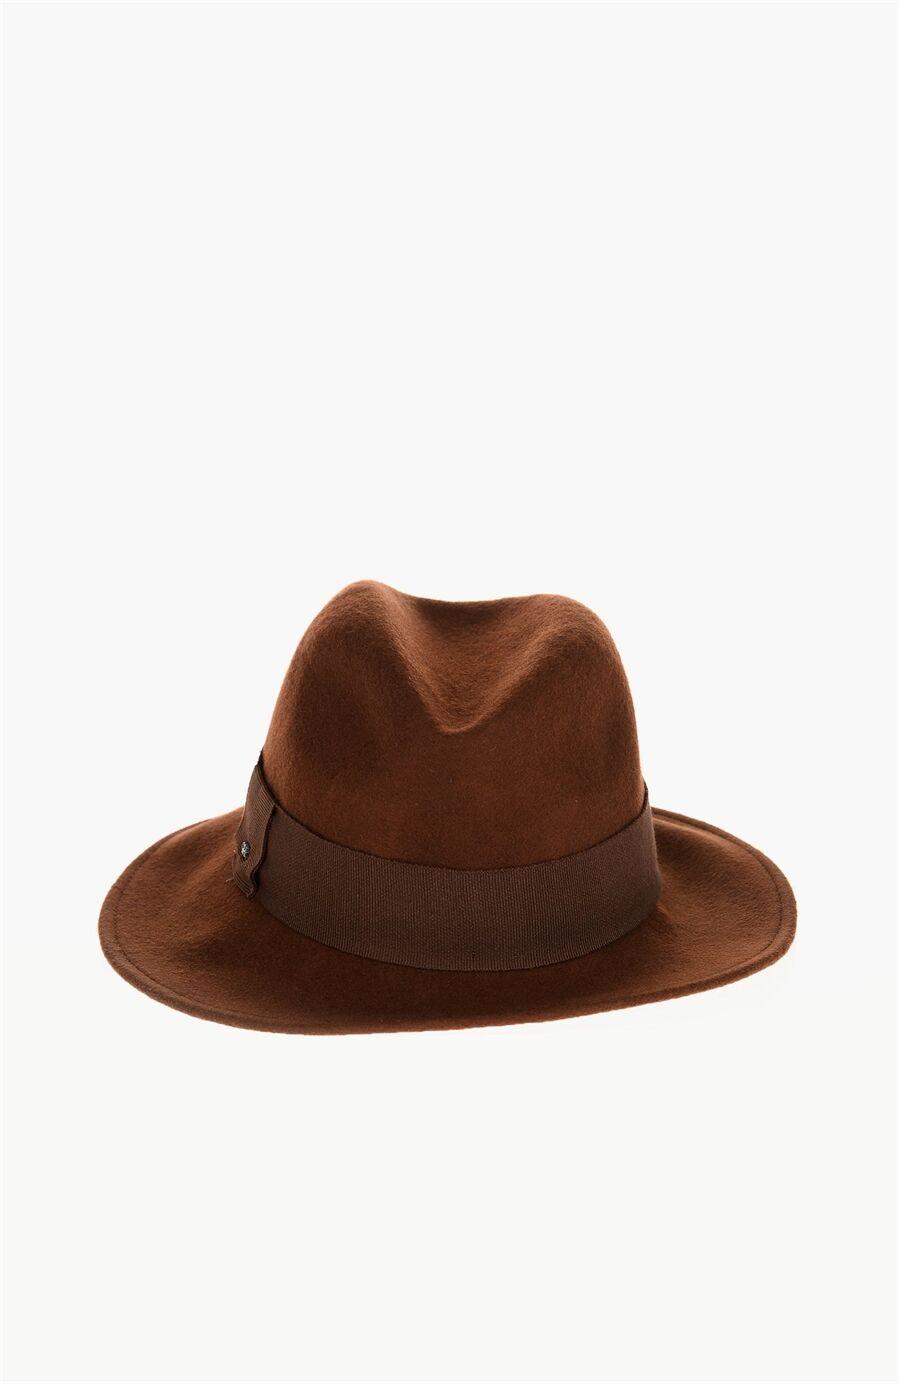 Yün Kahverengi Şapka